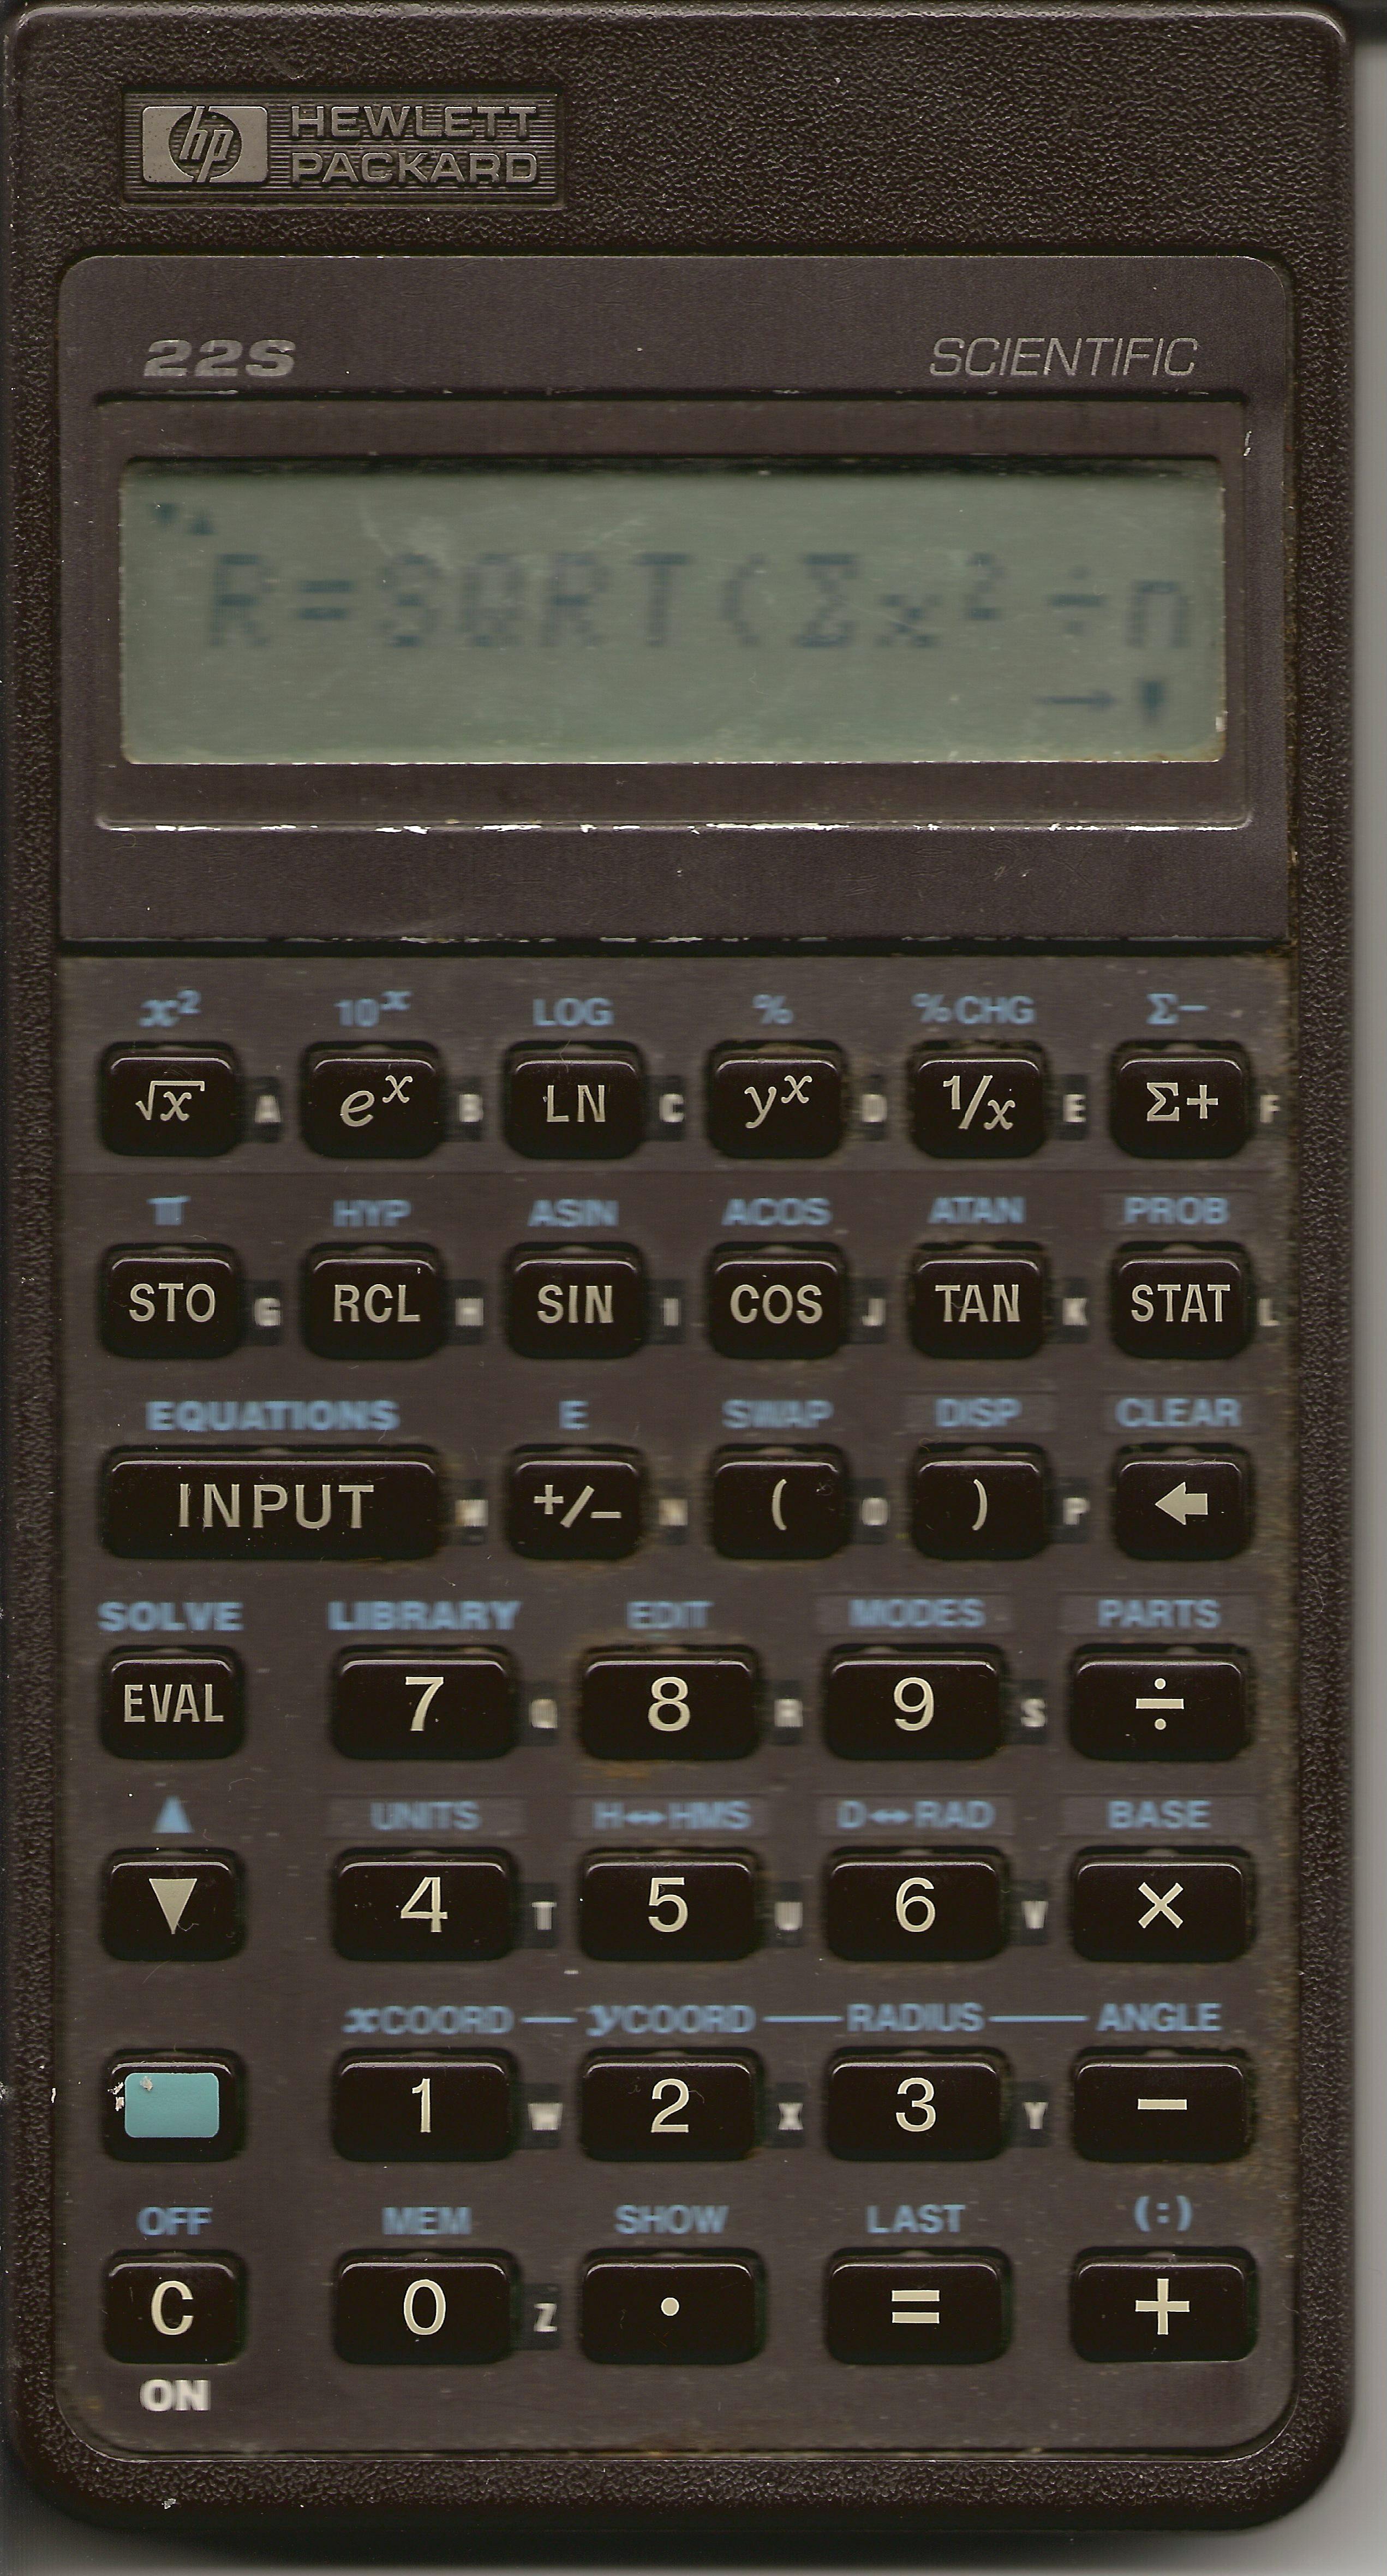 hp 22s calculator user manual